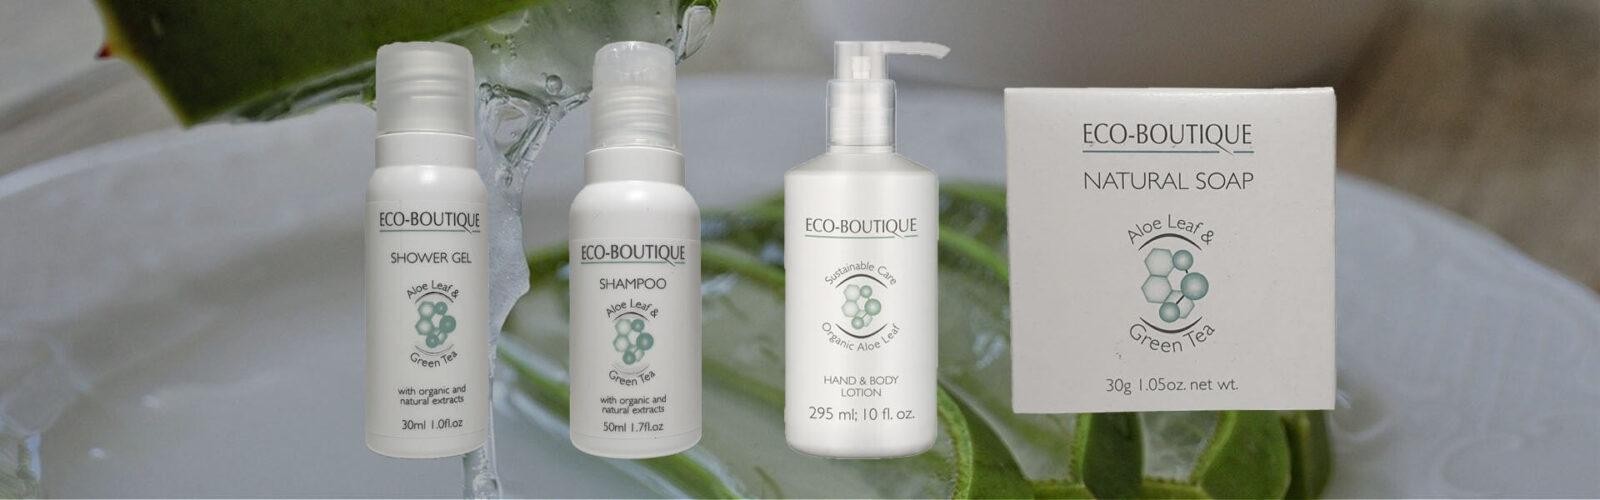 eco boutique косметика для гостиниц и отелей